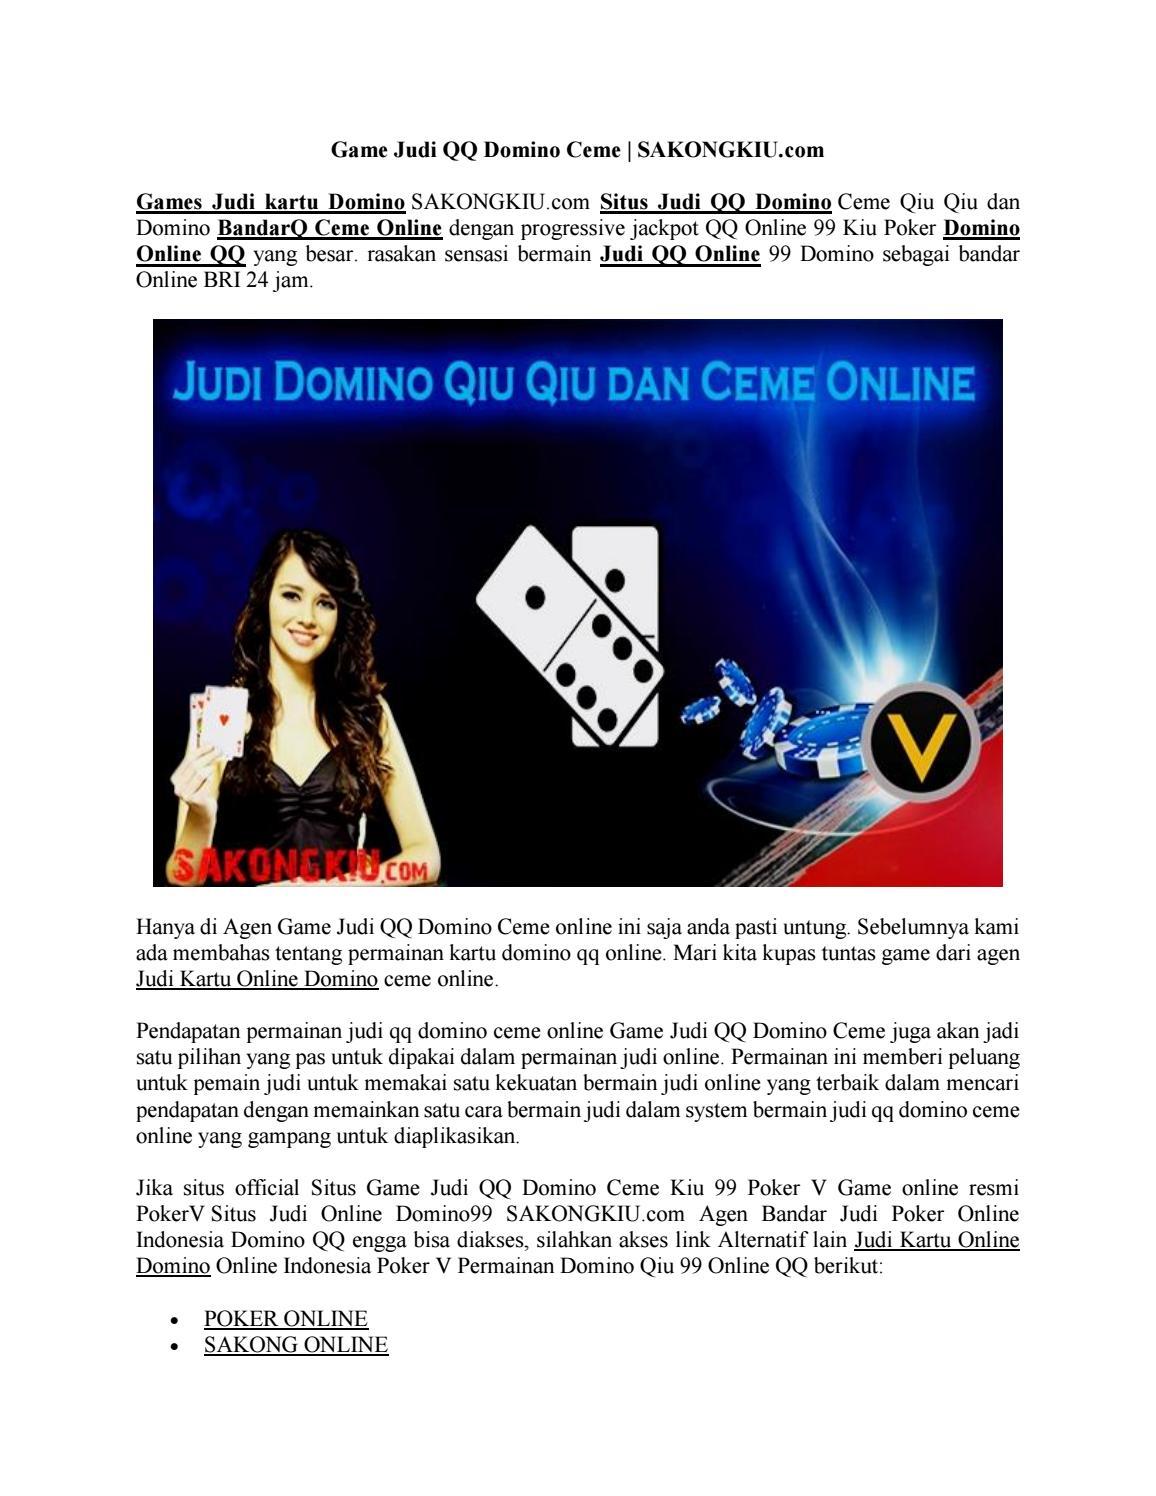 Game Judi Qq Domino Ceme Sakongkiu Com By Situs Judi Online Issuu